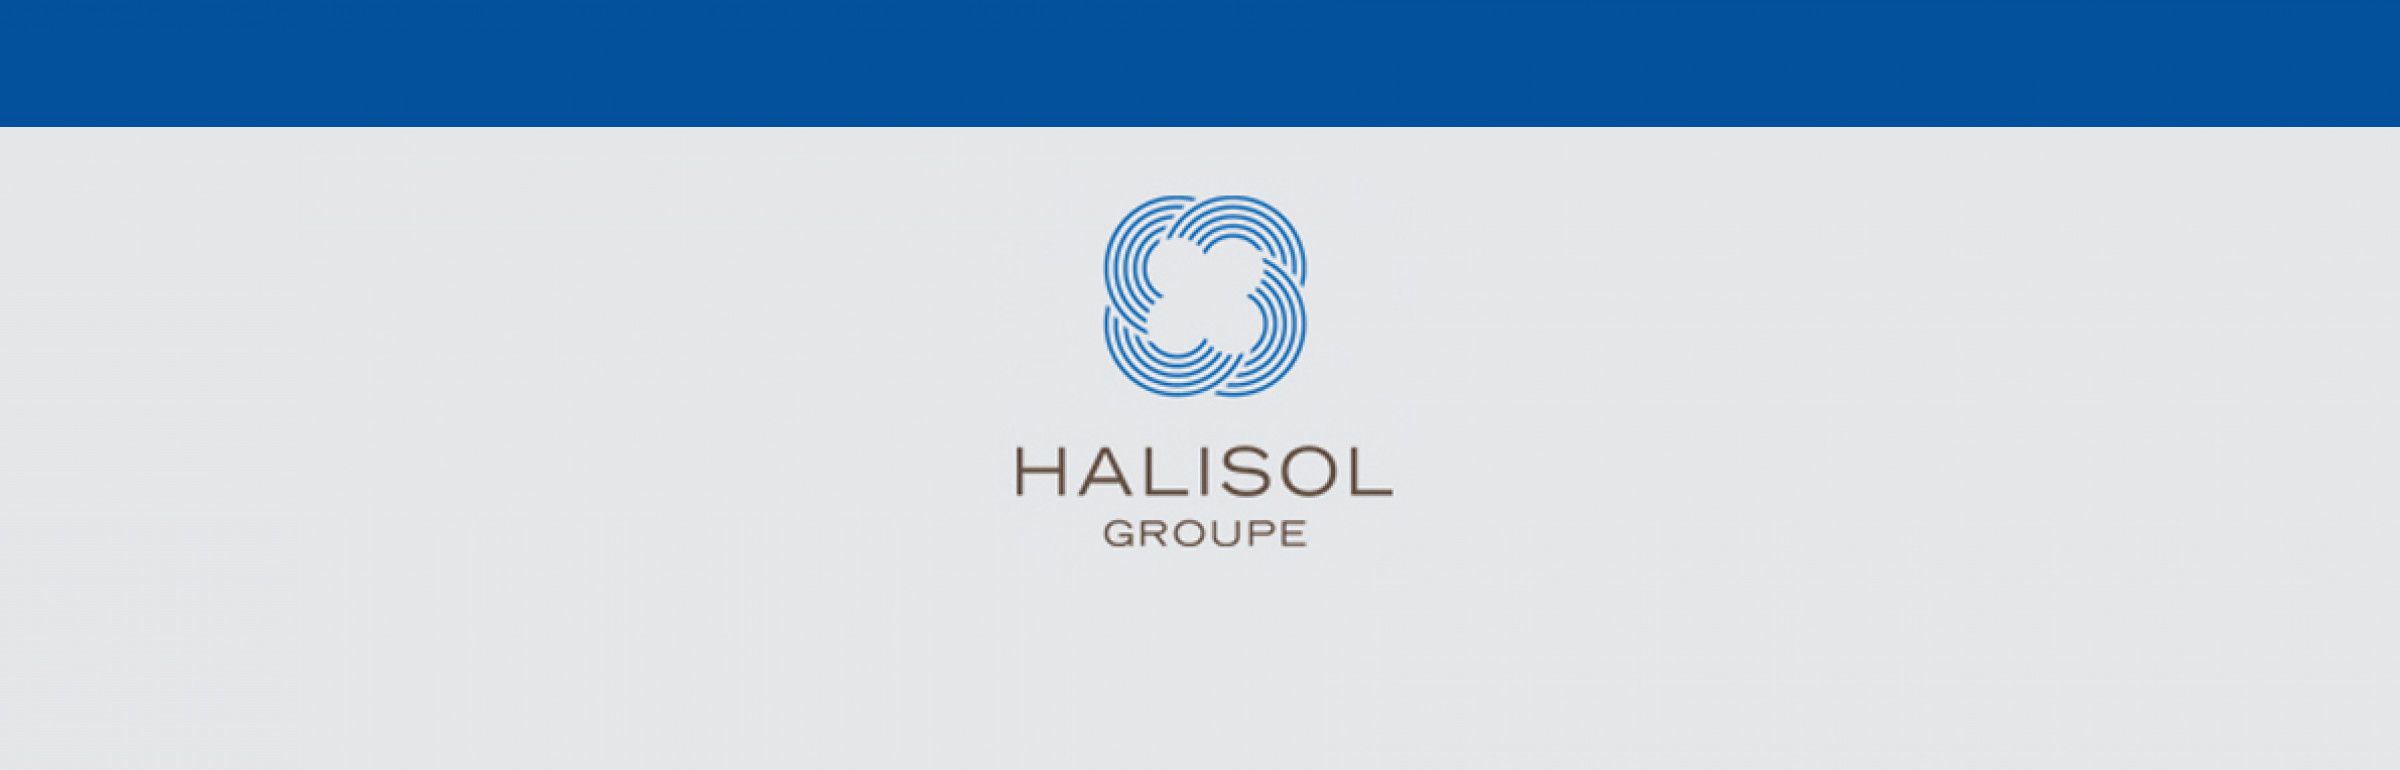 Banner Halisol Groupe